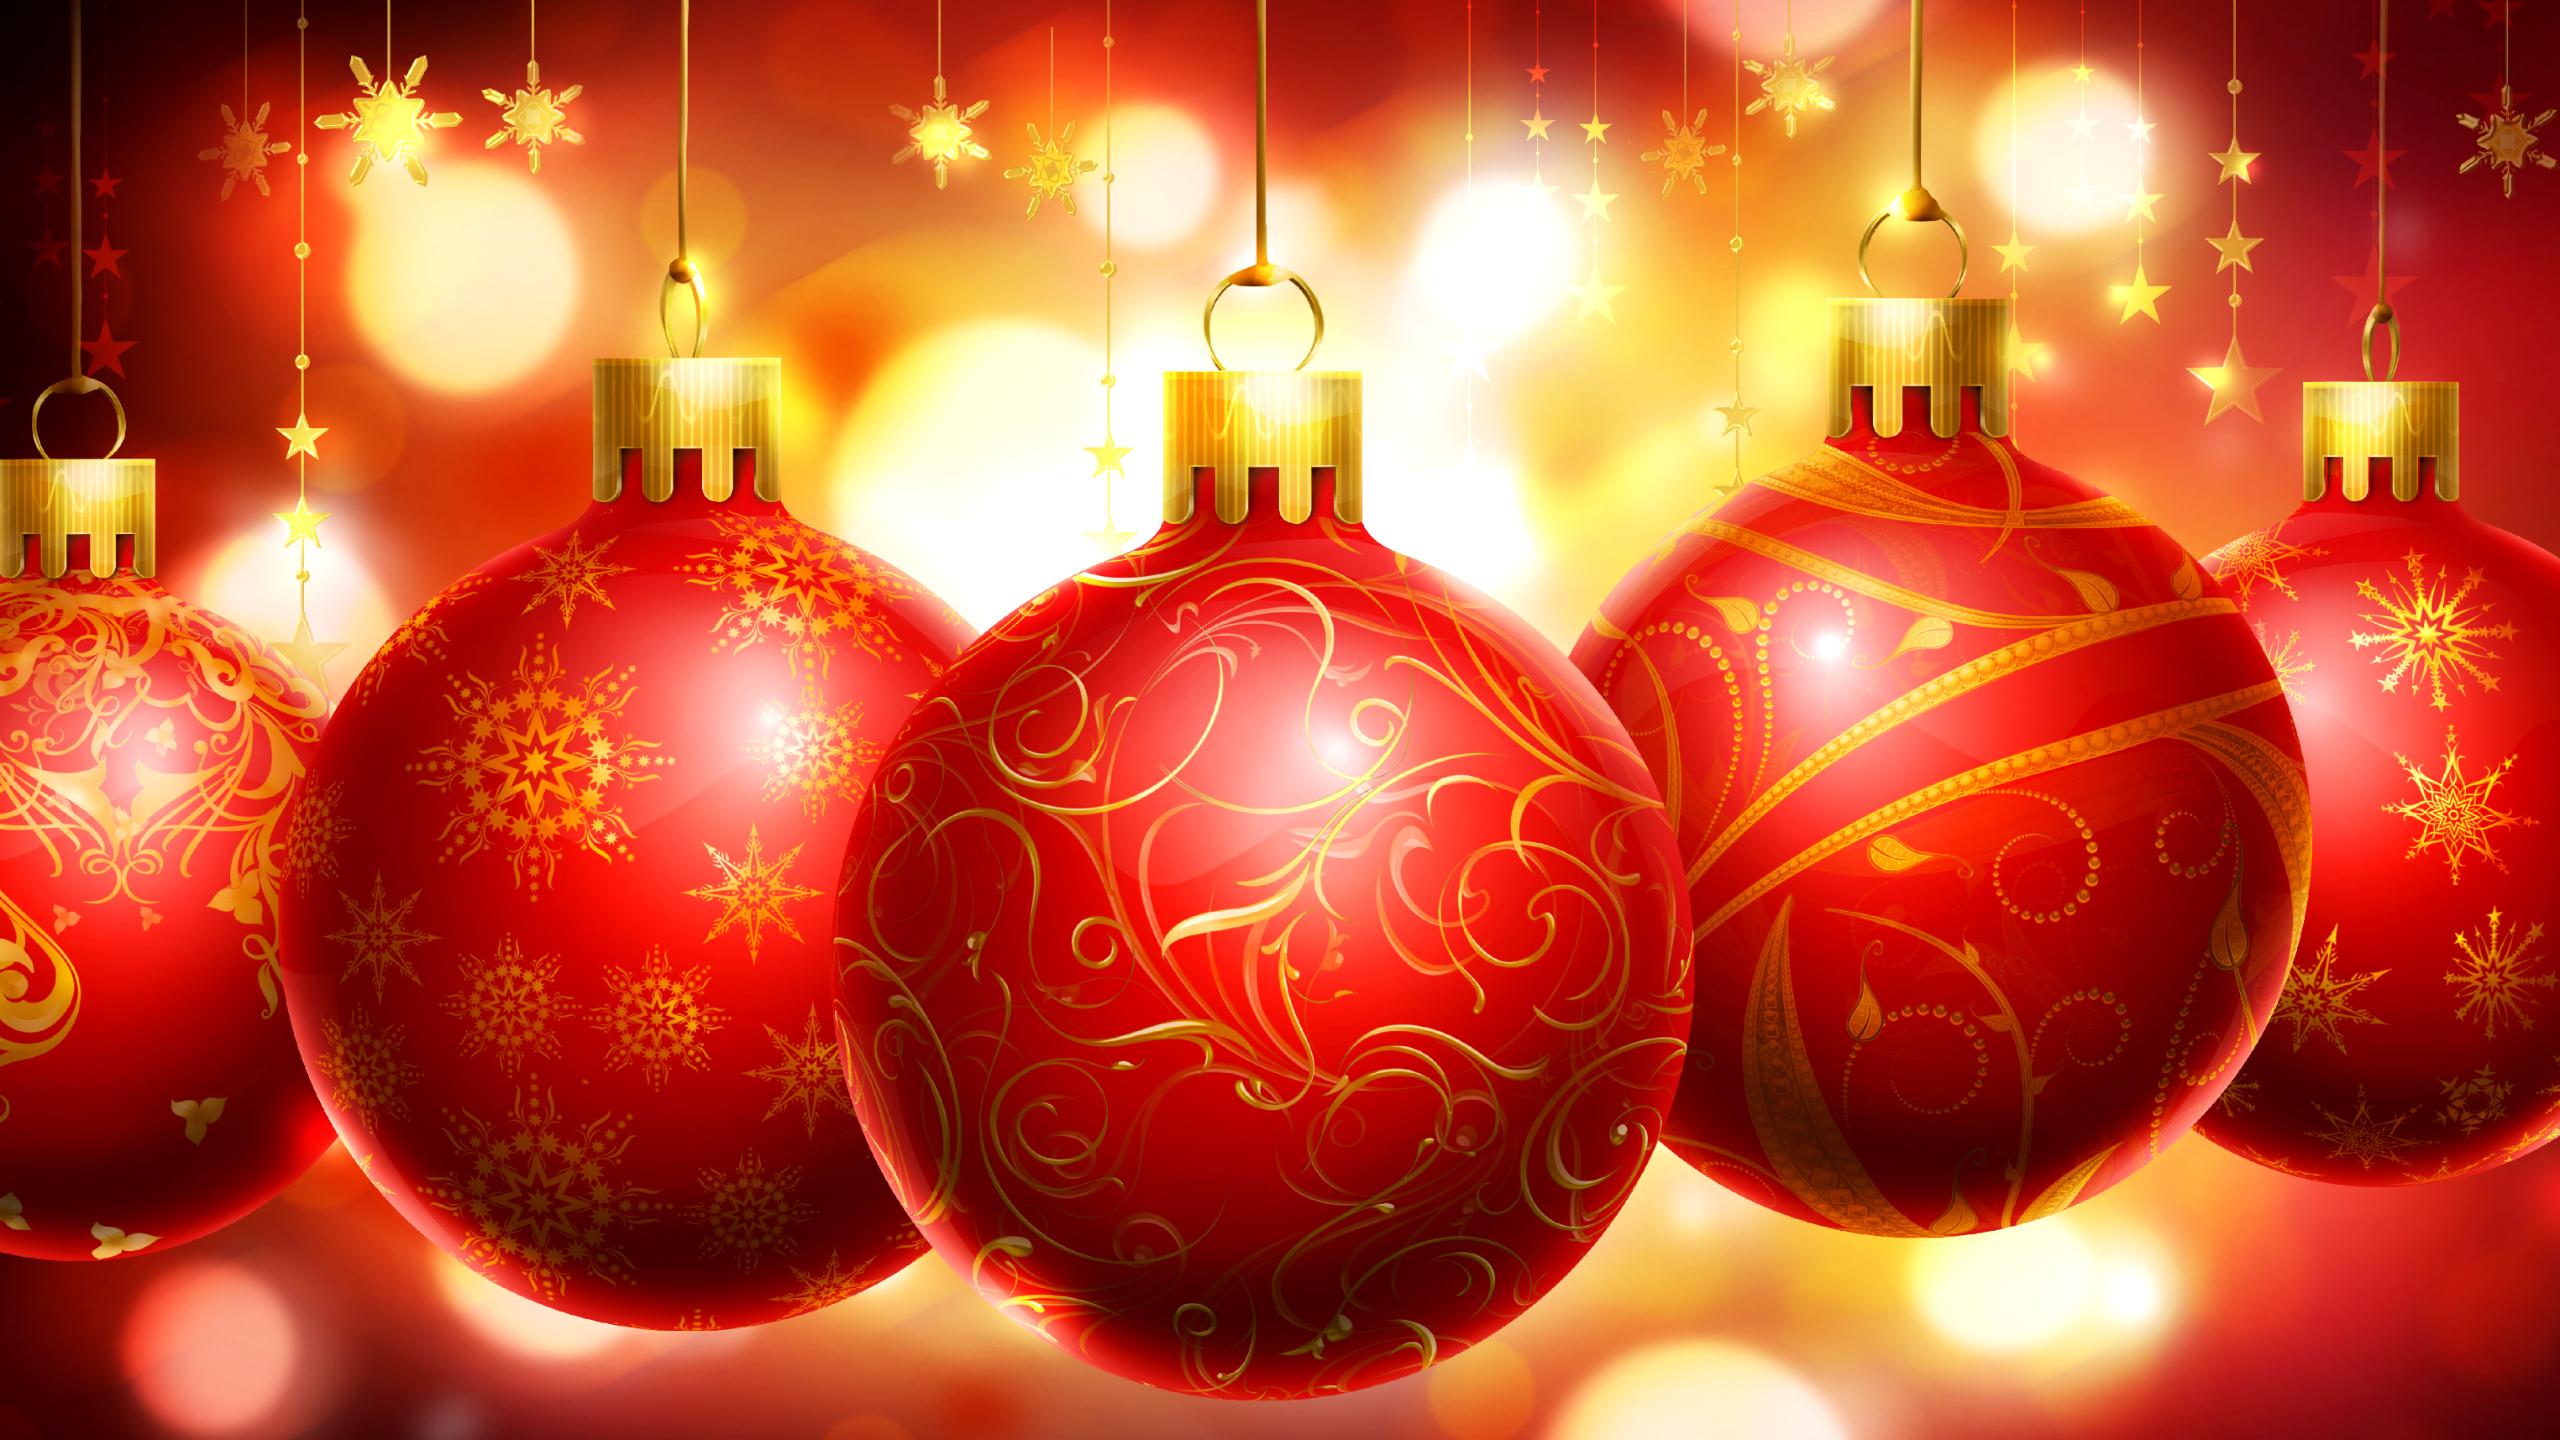 merry christmas christmas wallpaper 32793640 fanpop